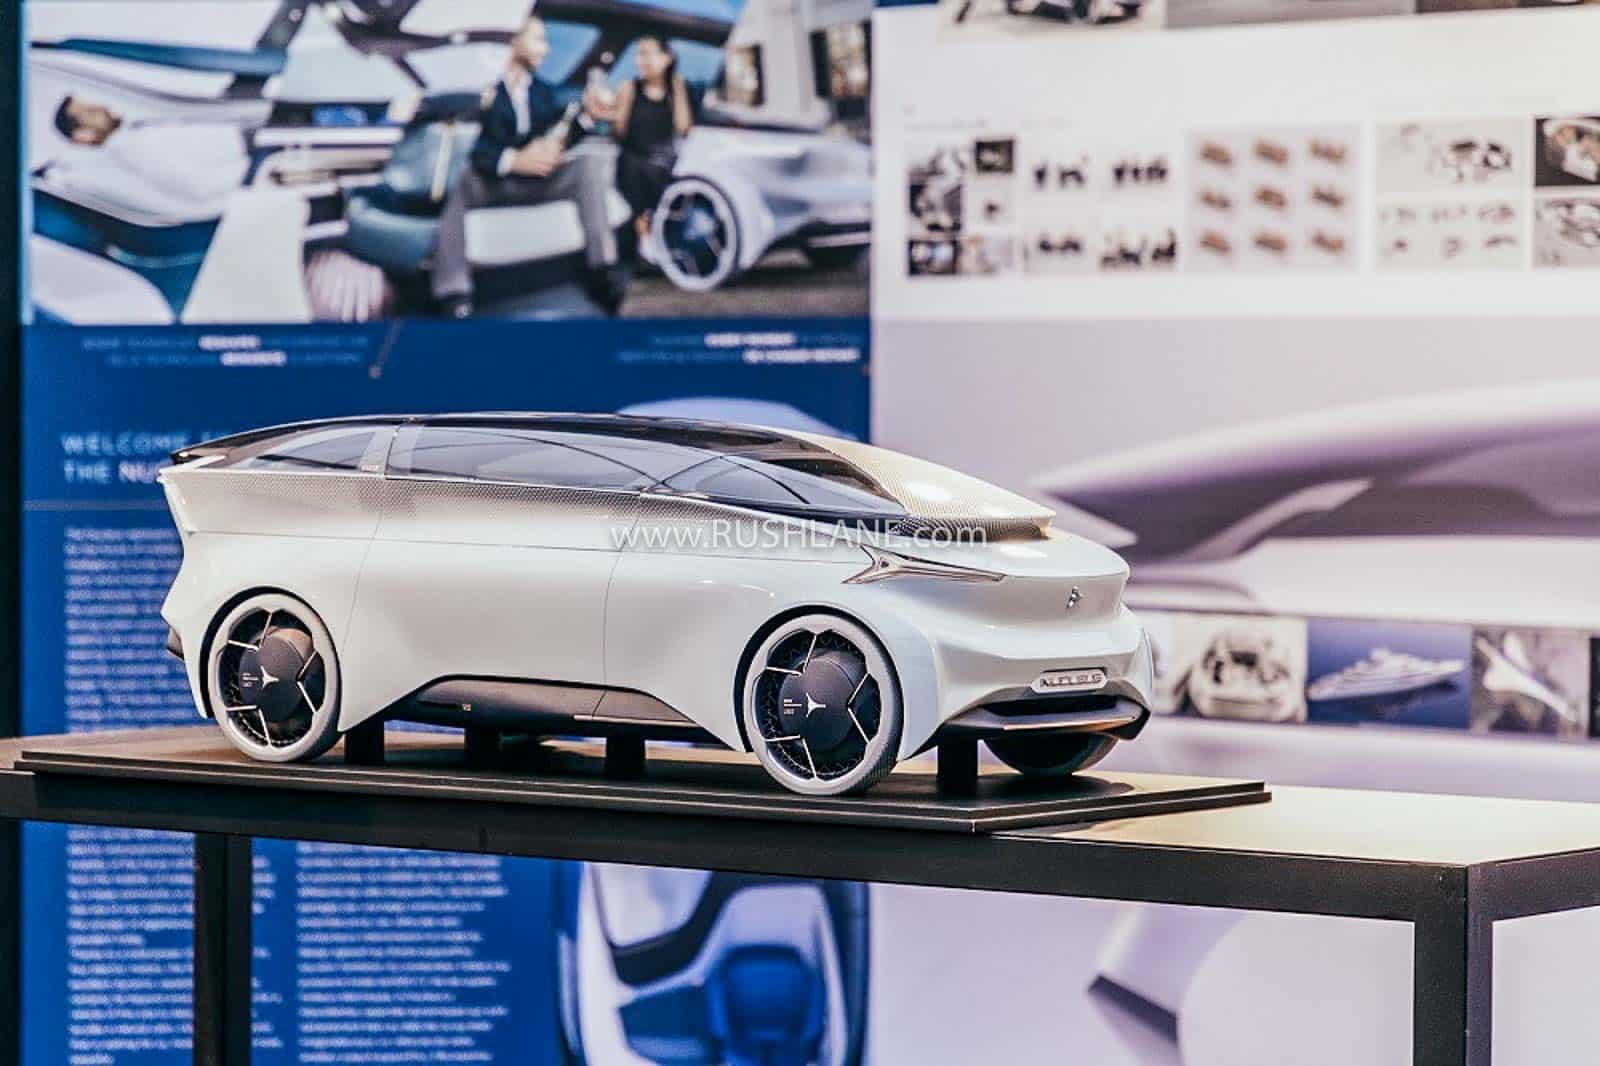 ICONA Nucleus electric car